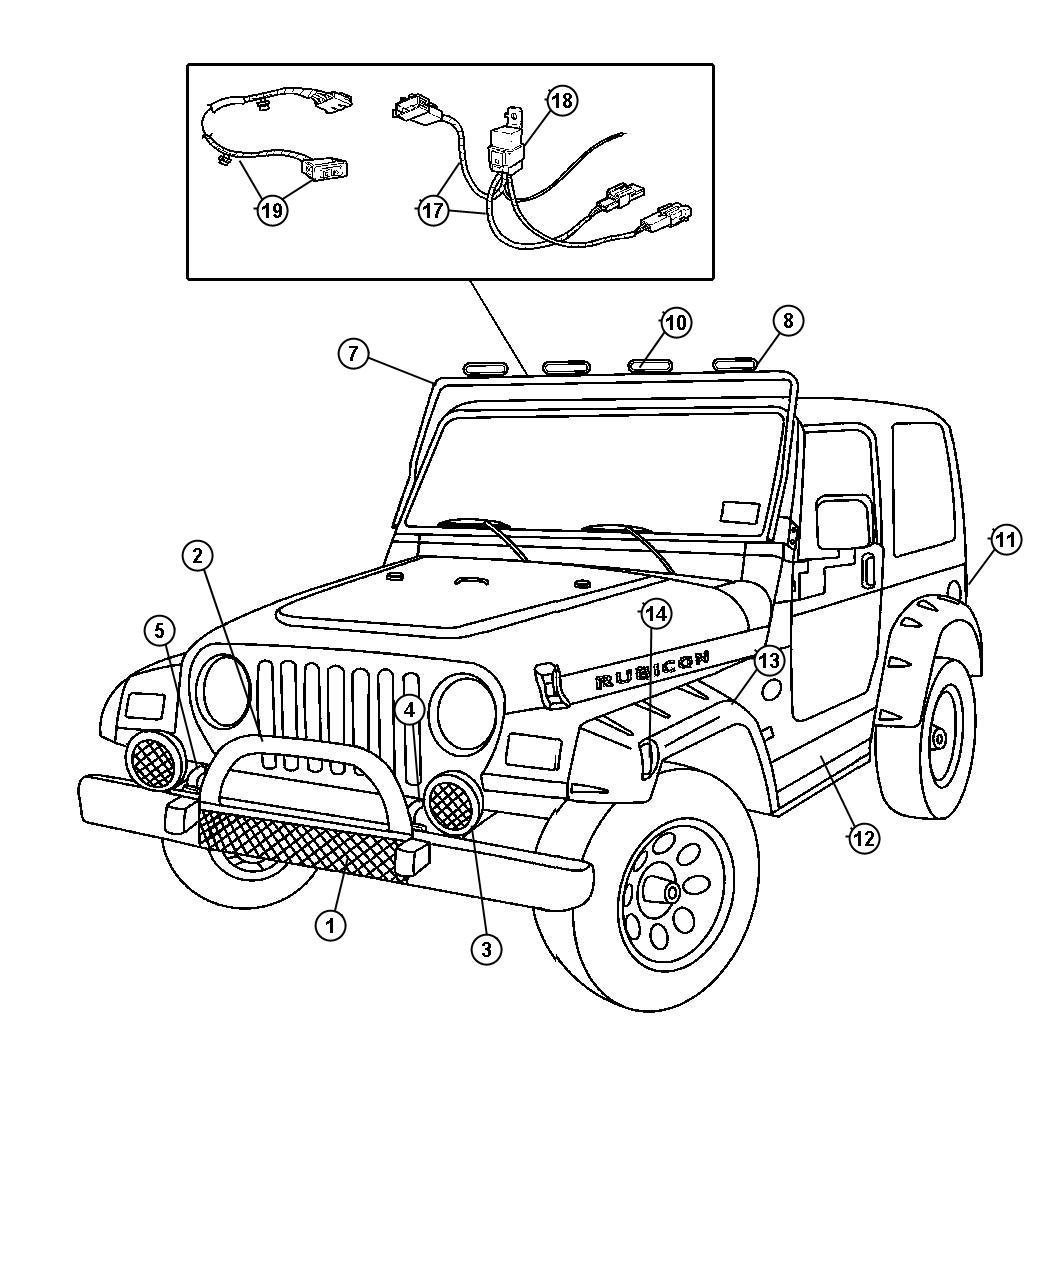 2003 Jeep Wrangler Cover kit. Light. Black cover for tomb